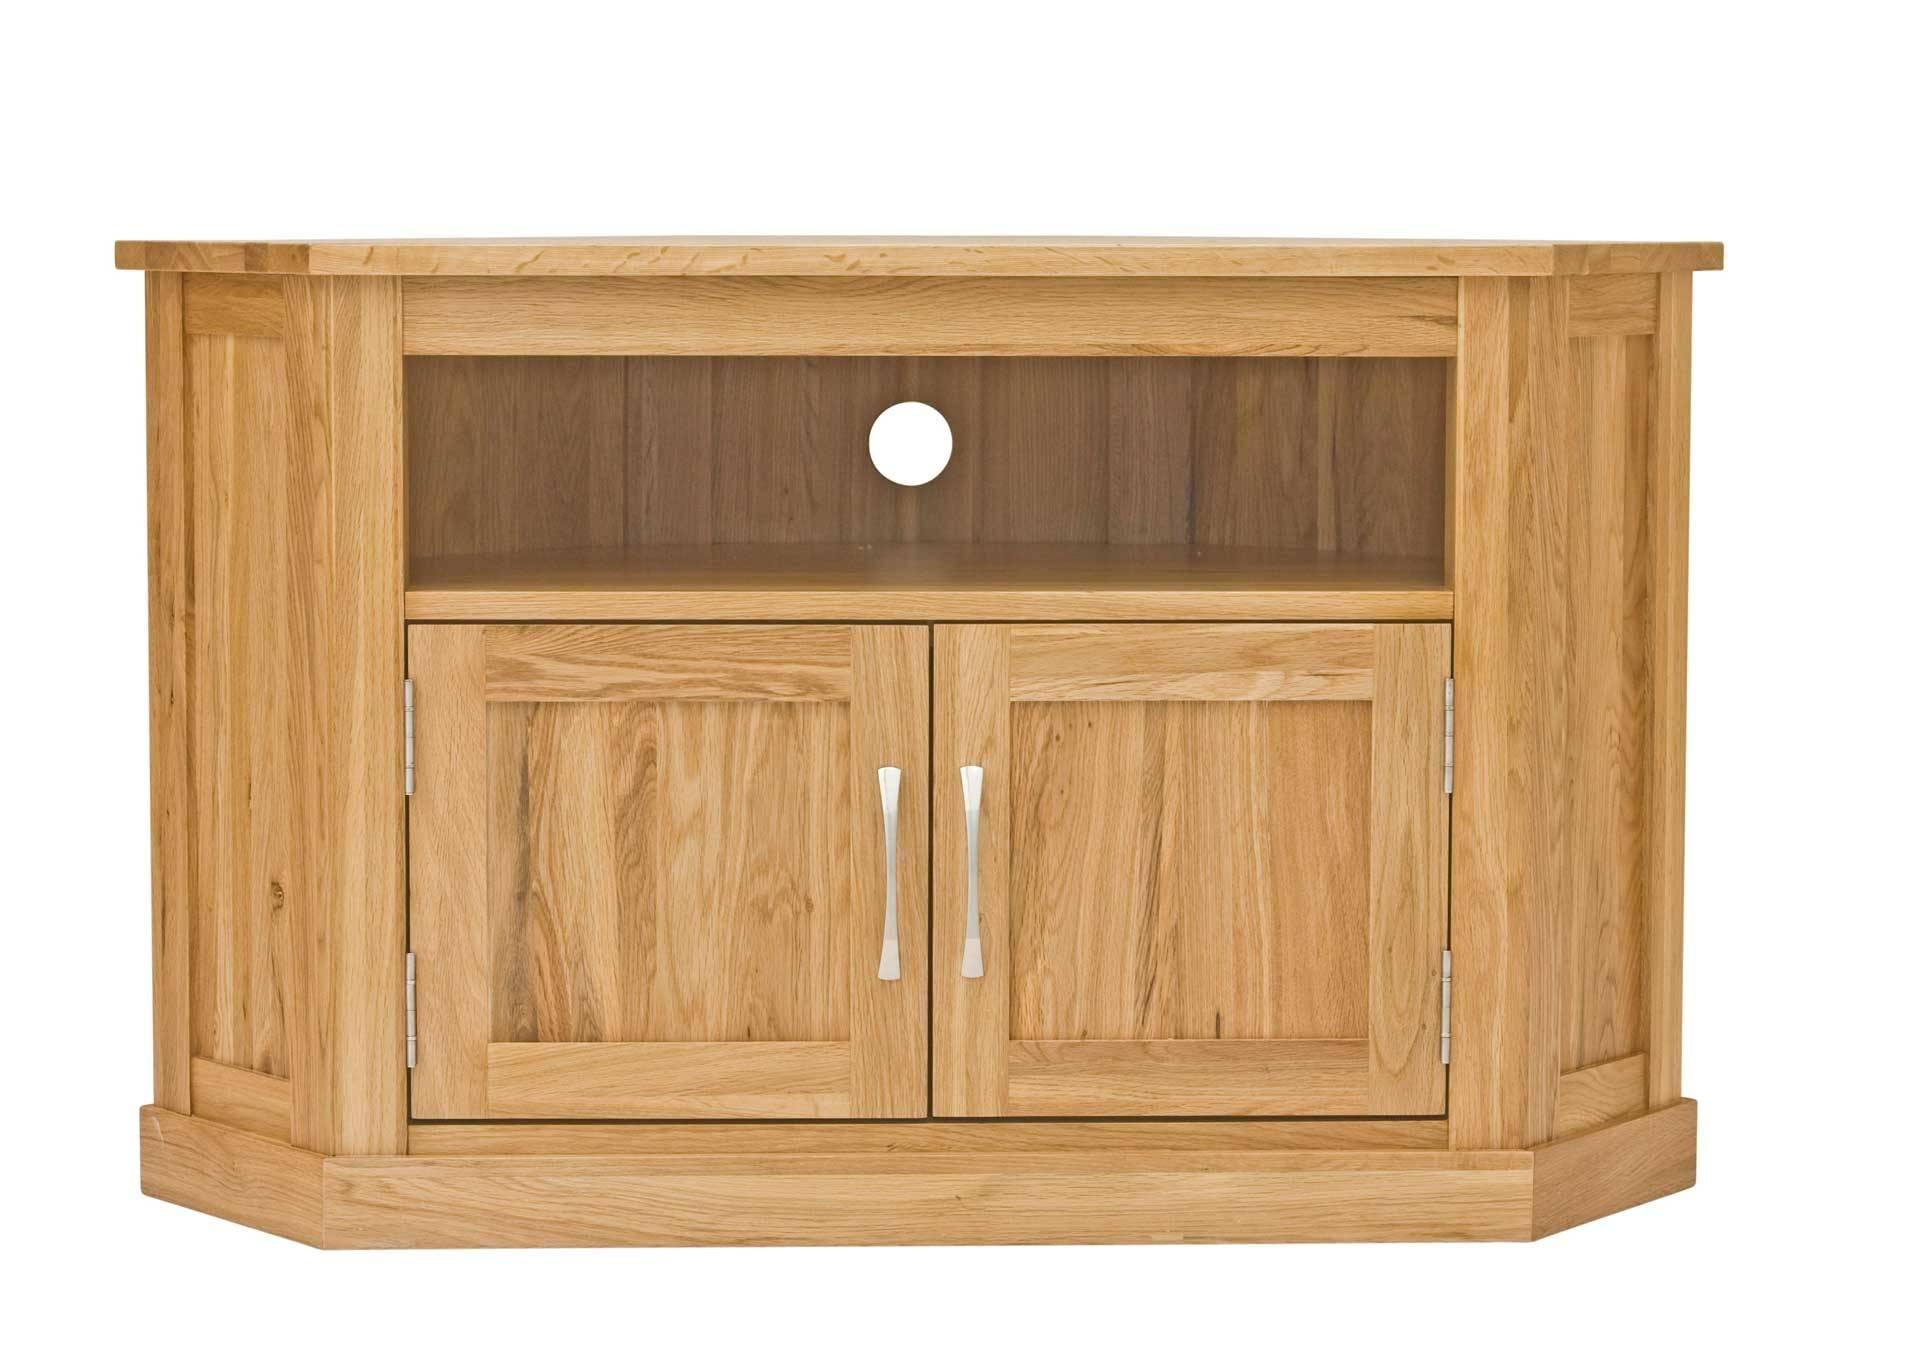 Classic Oak Corner Television Cabinet | Hampshire Furniture within Wood Corner Tv Cabinets (Image 2 of 15)